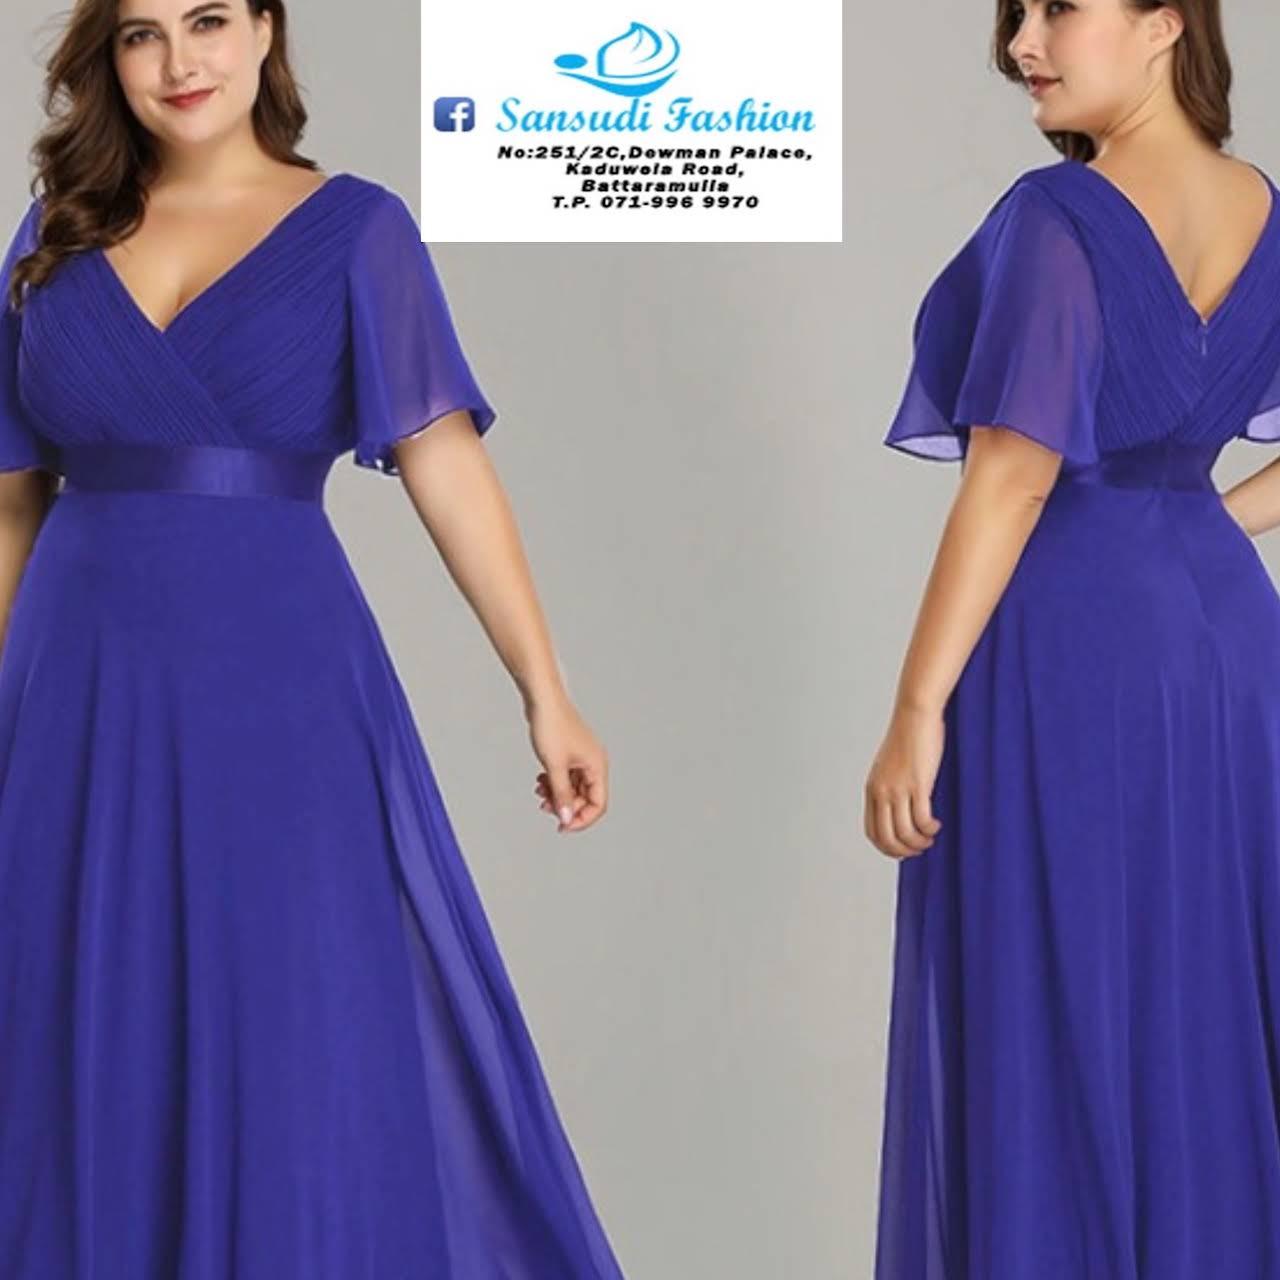 Normal Frock Designs 2017 Sri Lanka: Best Place For Ladies Party Wear In Sri